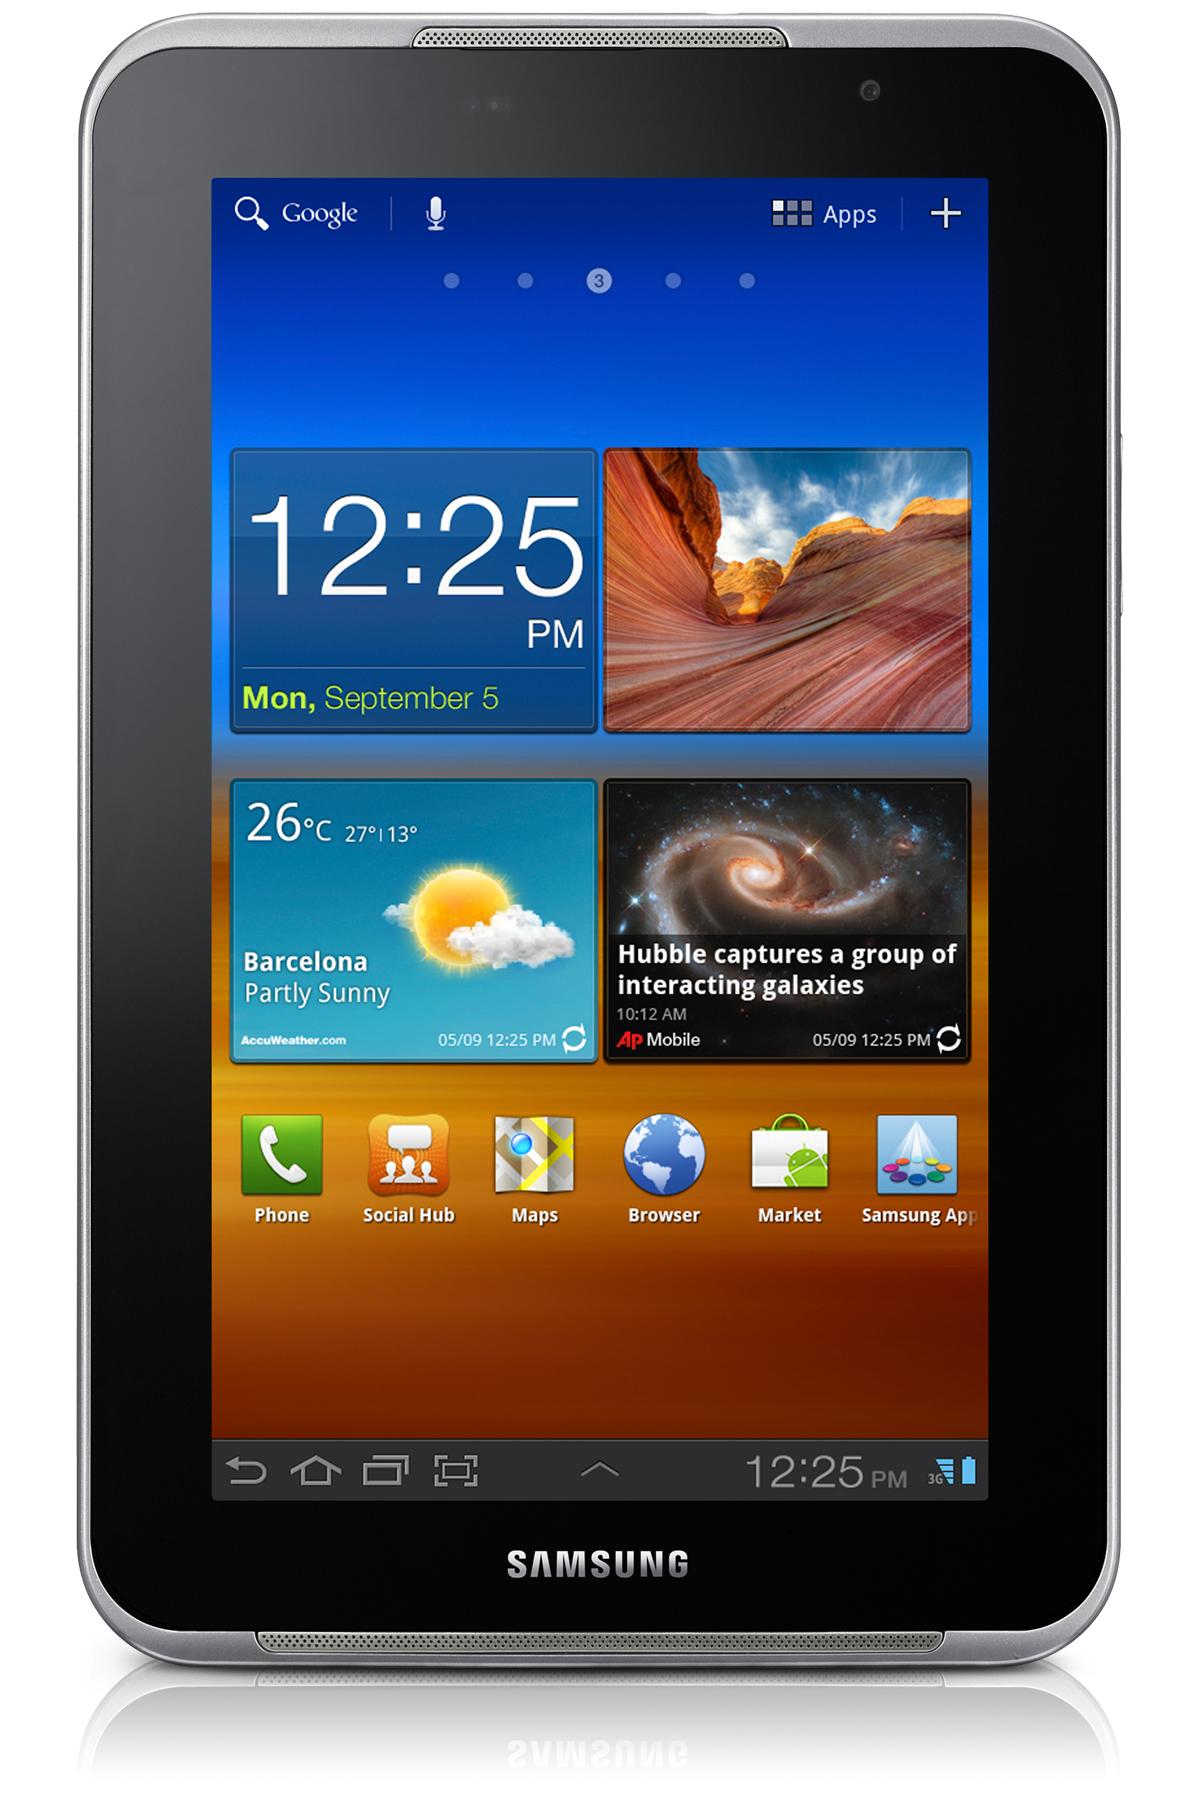 Galaxy Tab Plus (7.0, Wi-Fi)